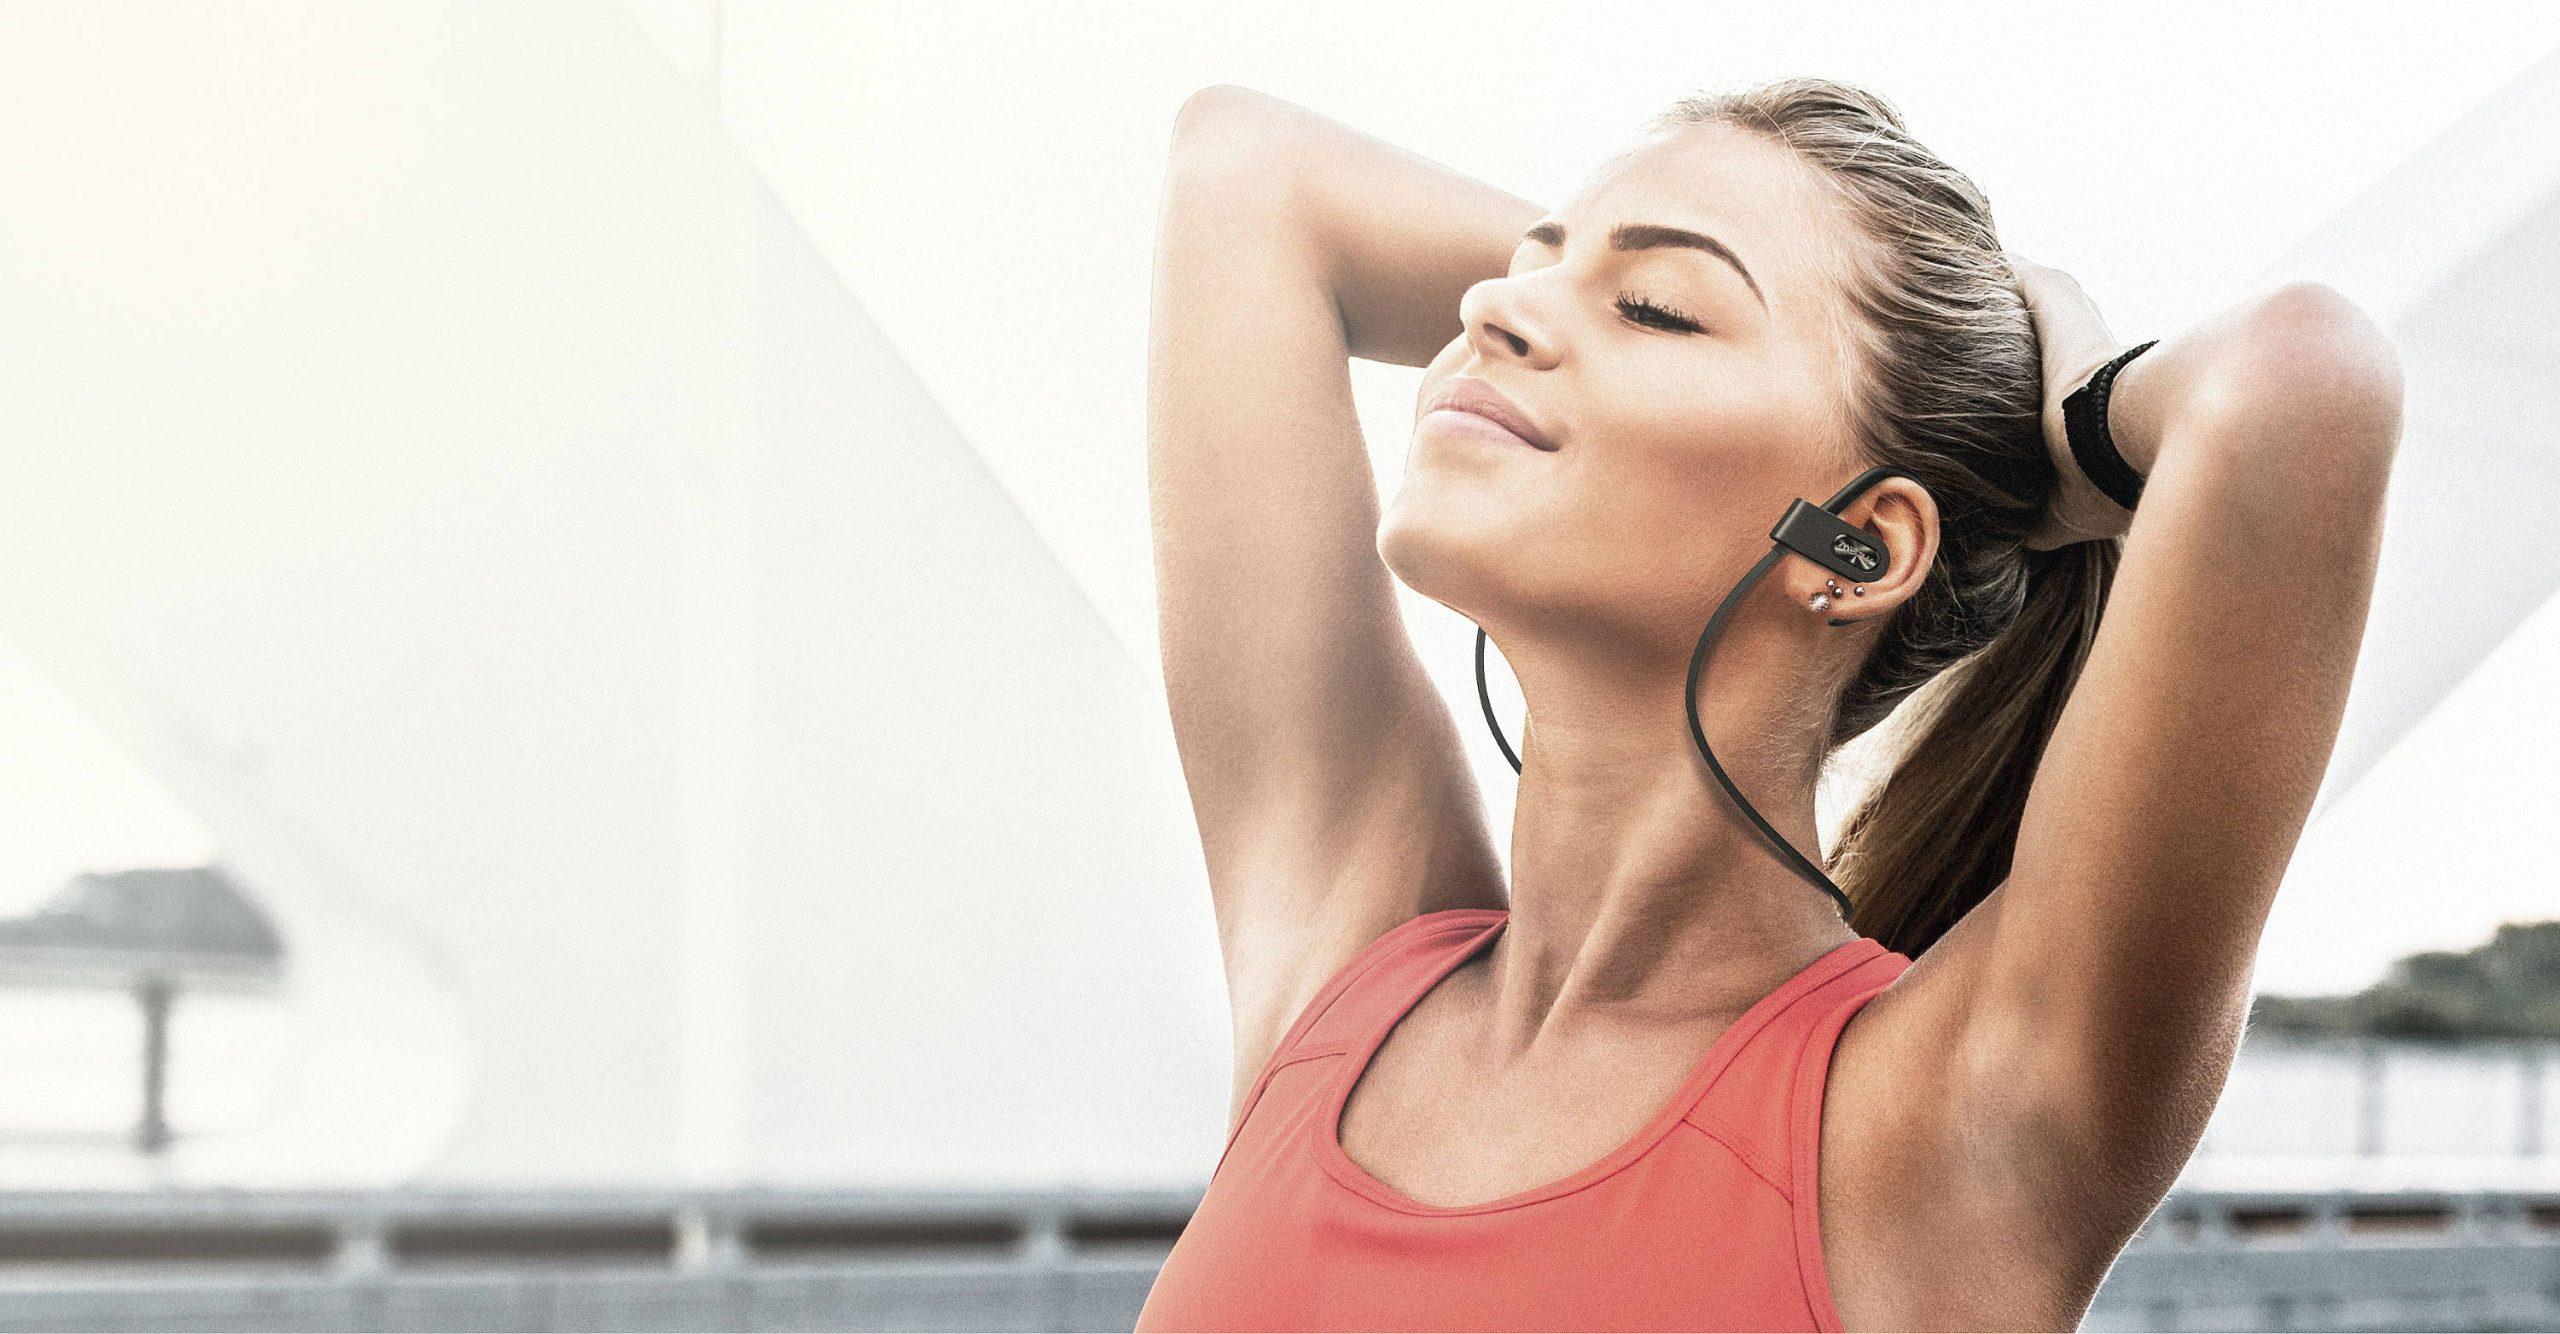 mpow-flame-2-sports-earphones